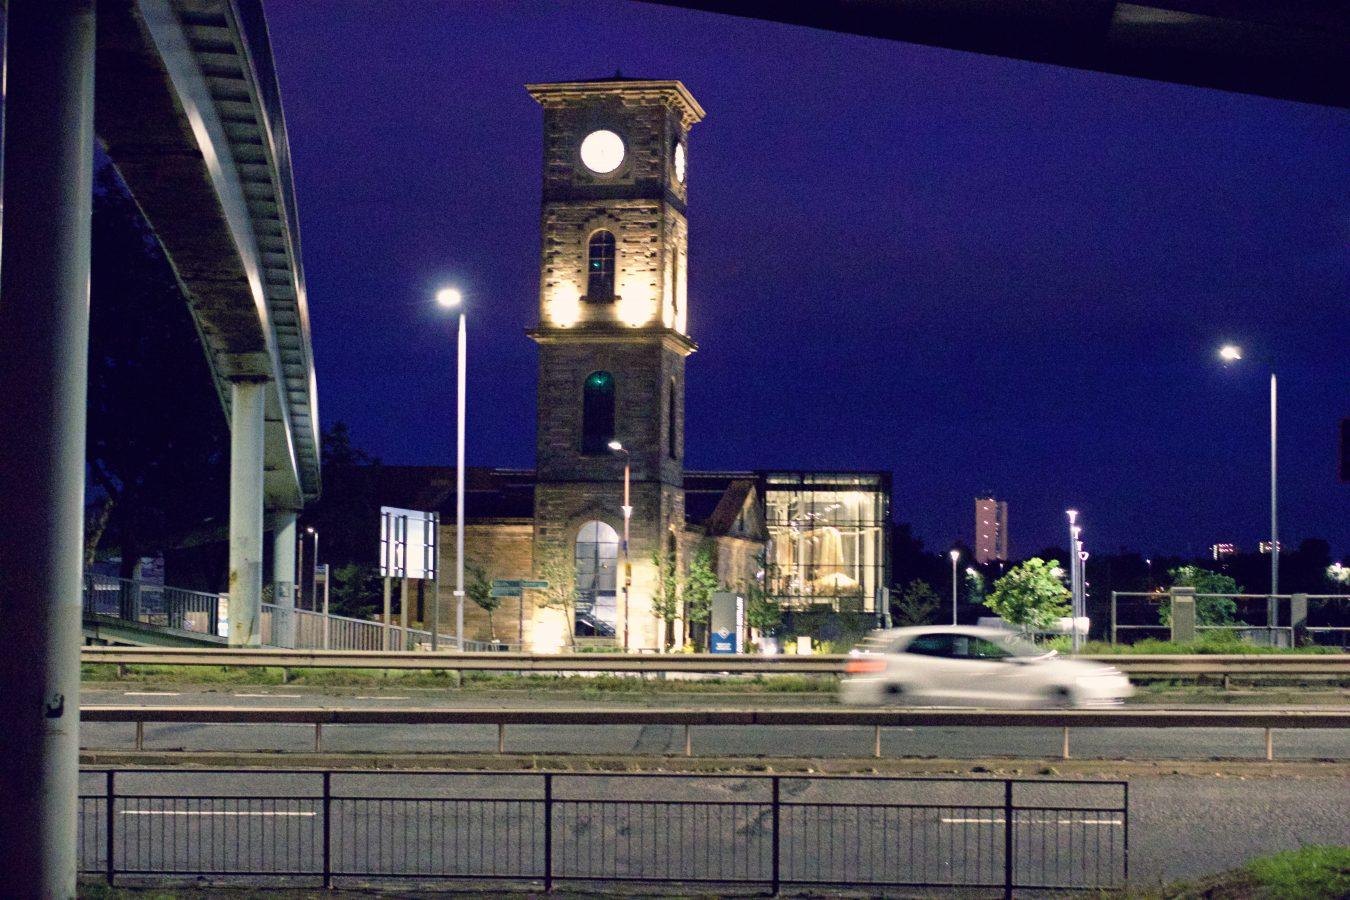 Glasgow Expressway at night